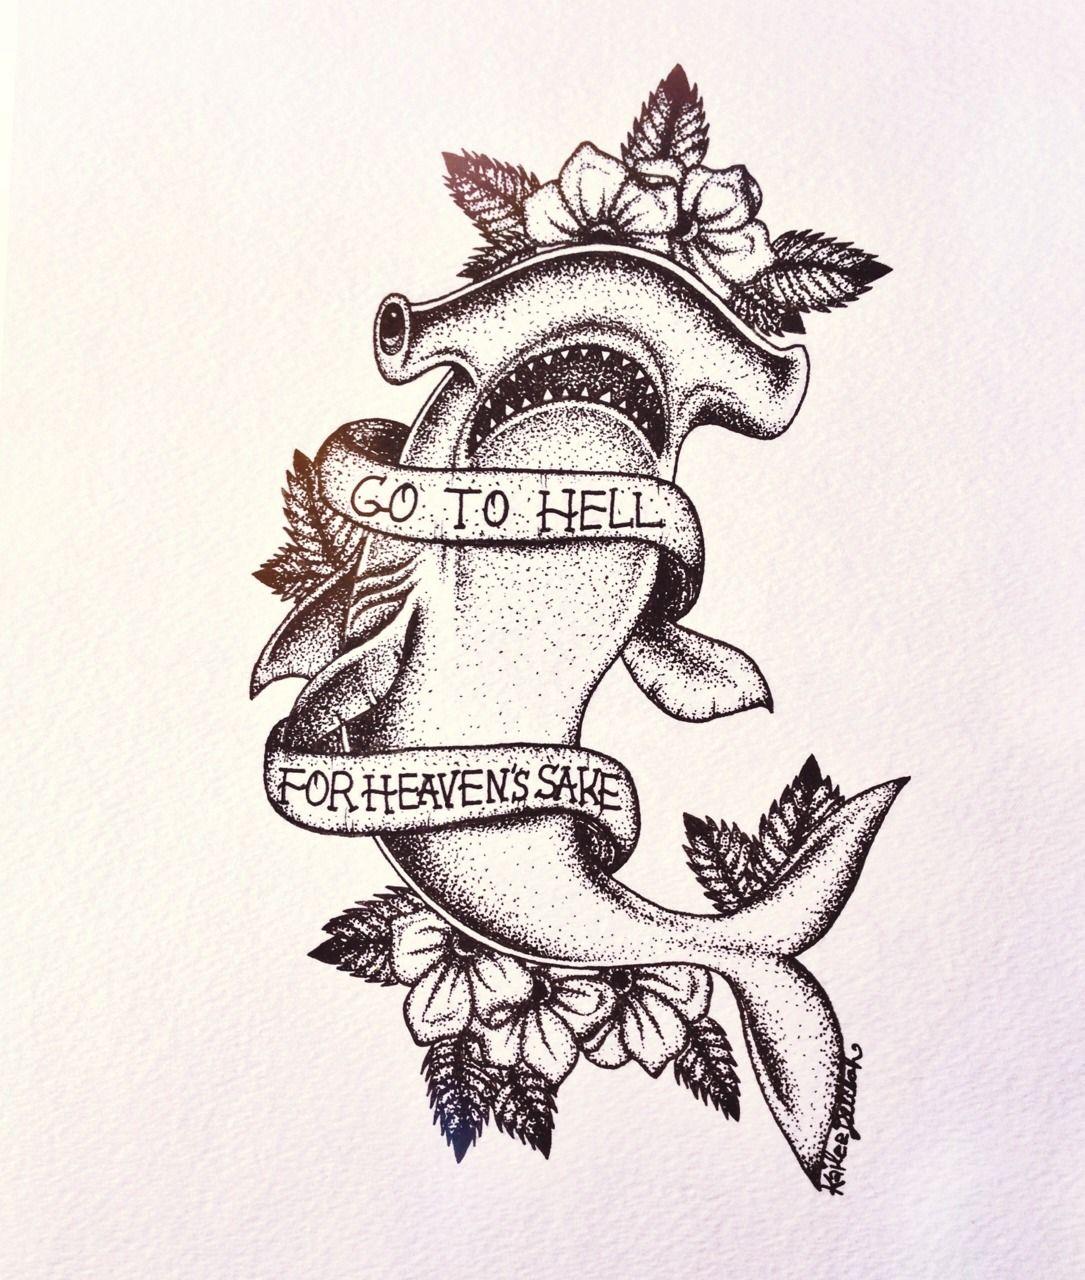 xmermaidbonesx (With images) Shark tattoos, Tattoos